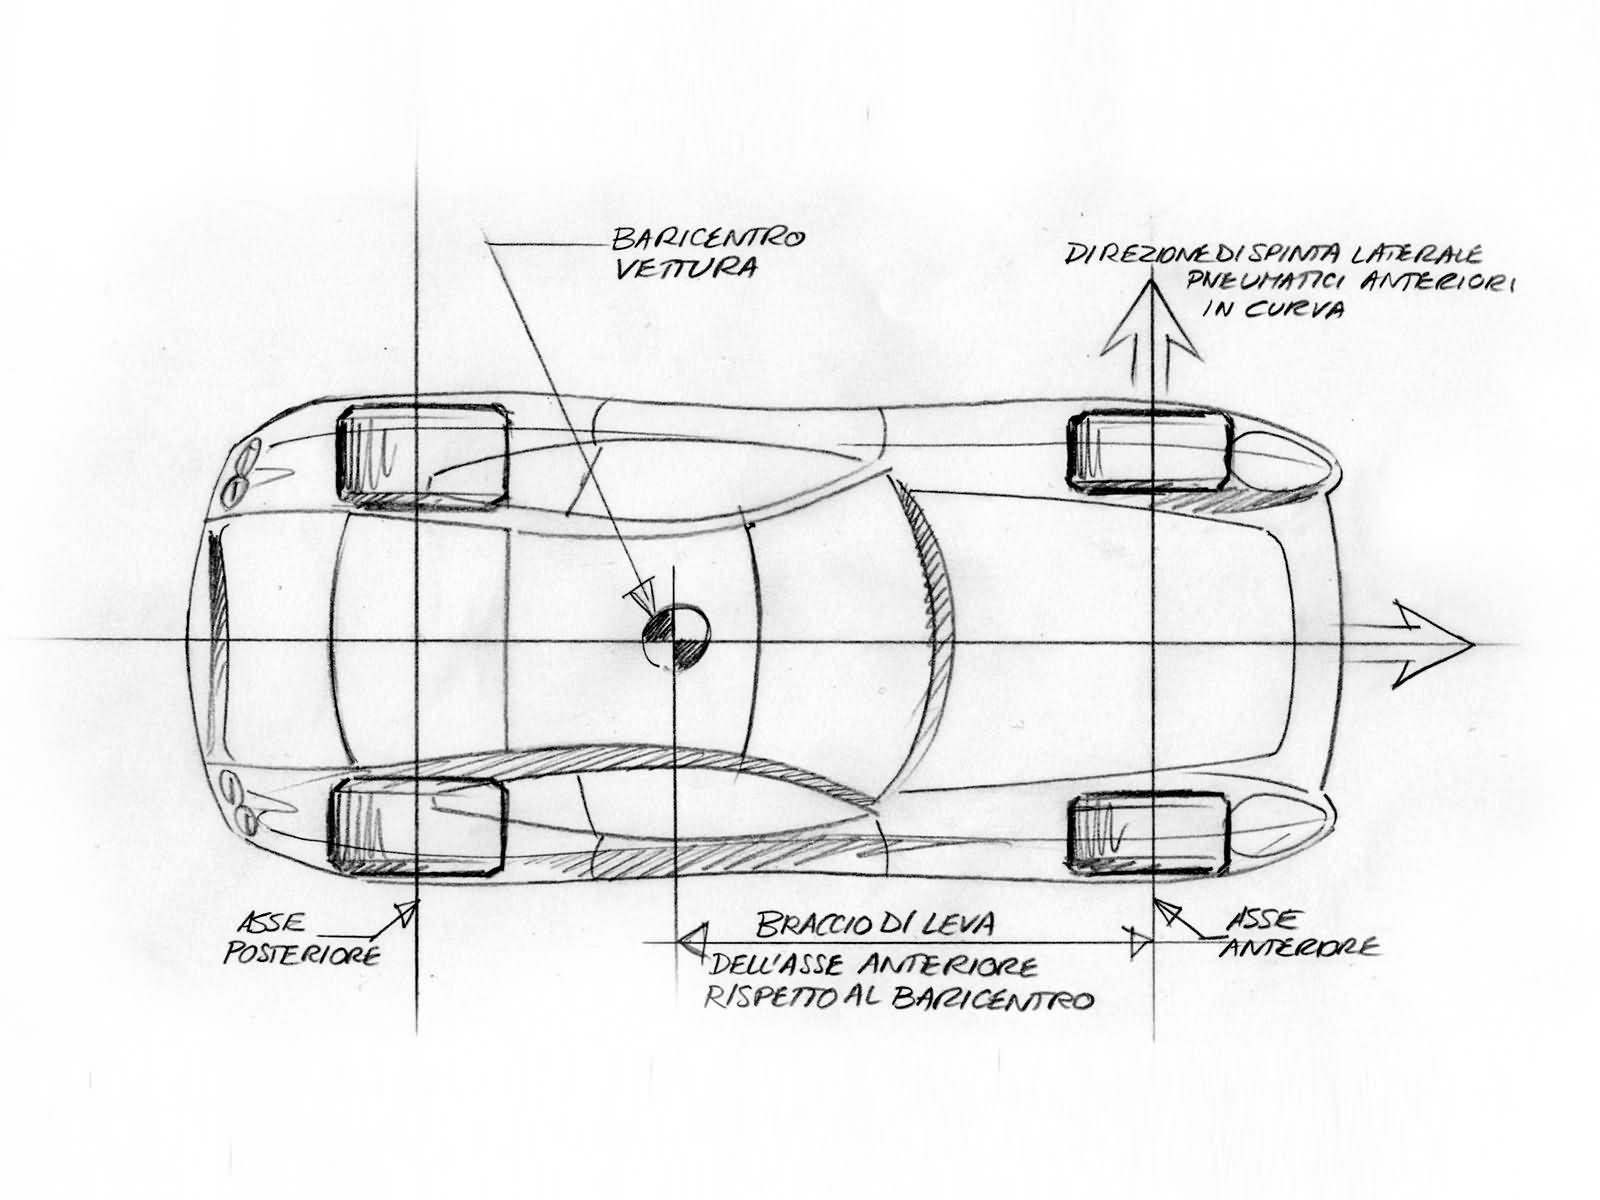 Hintergrundbilder : Ferrari, Netcarshow, Netcar, Auto Bilder, Auto ...